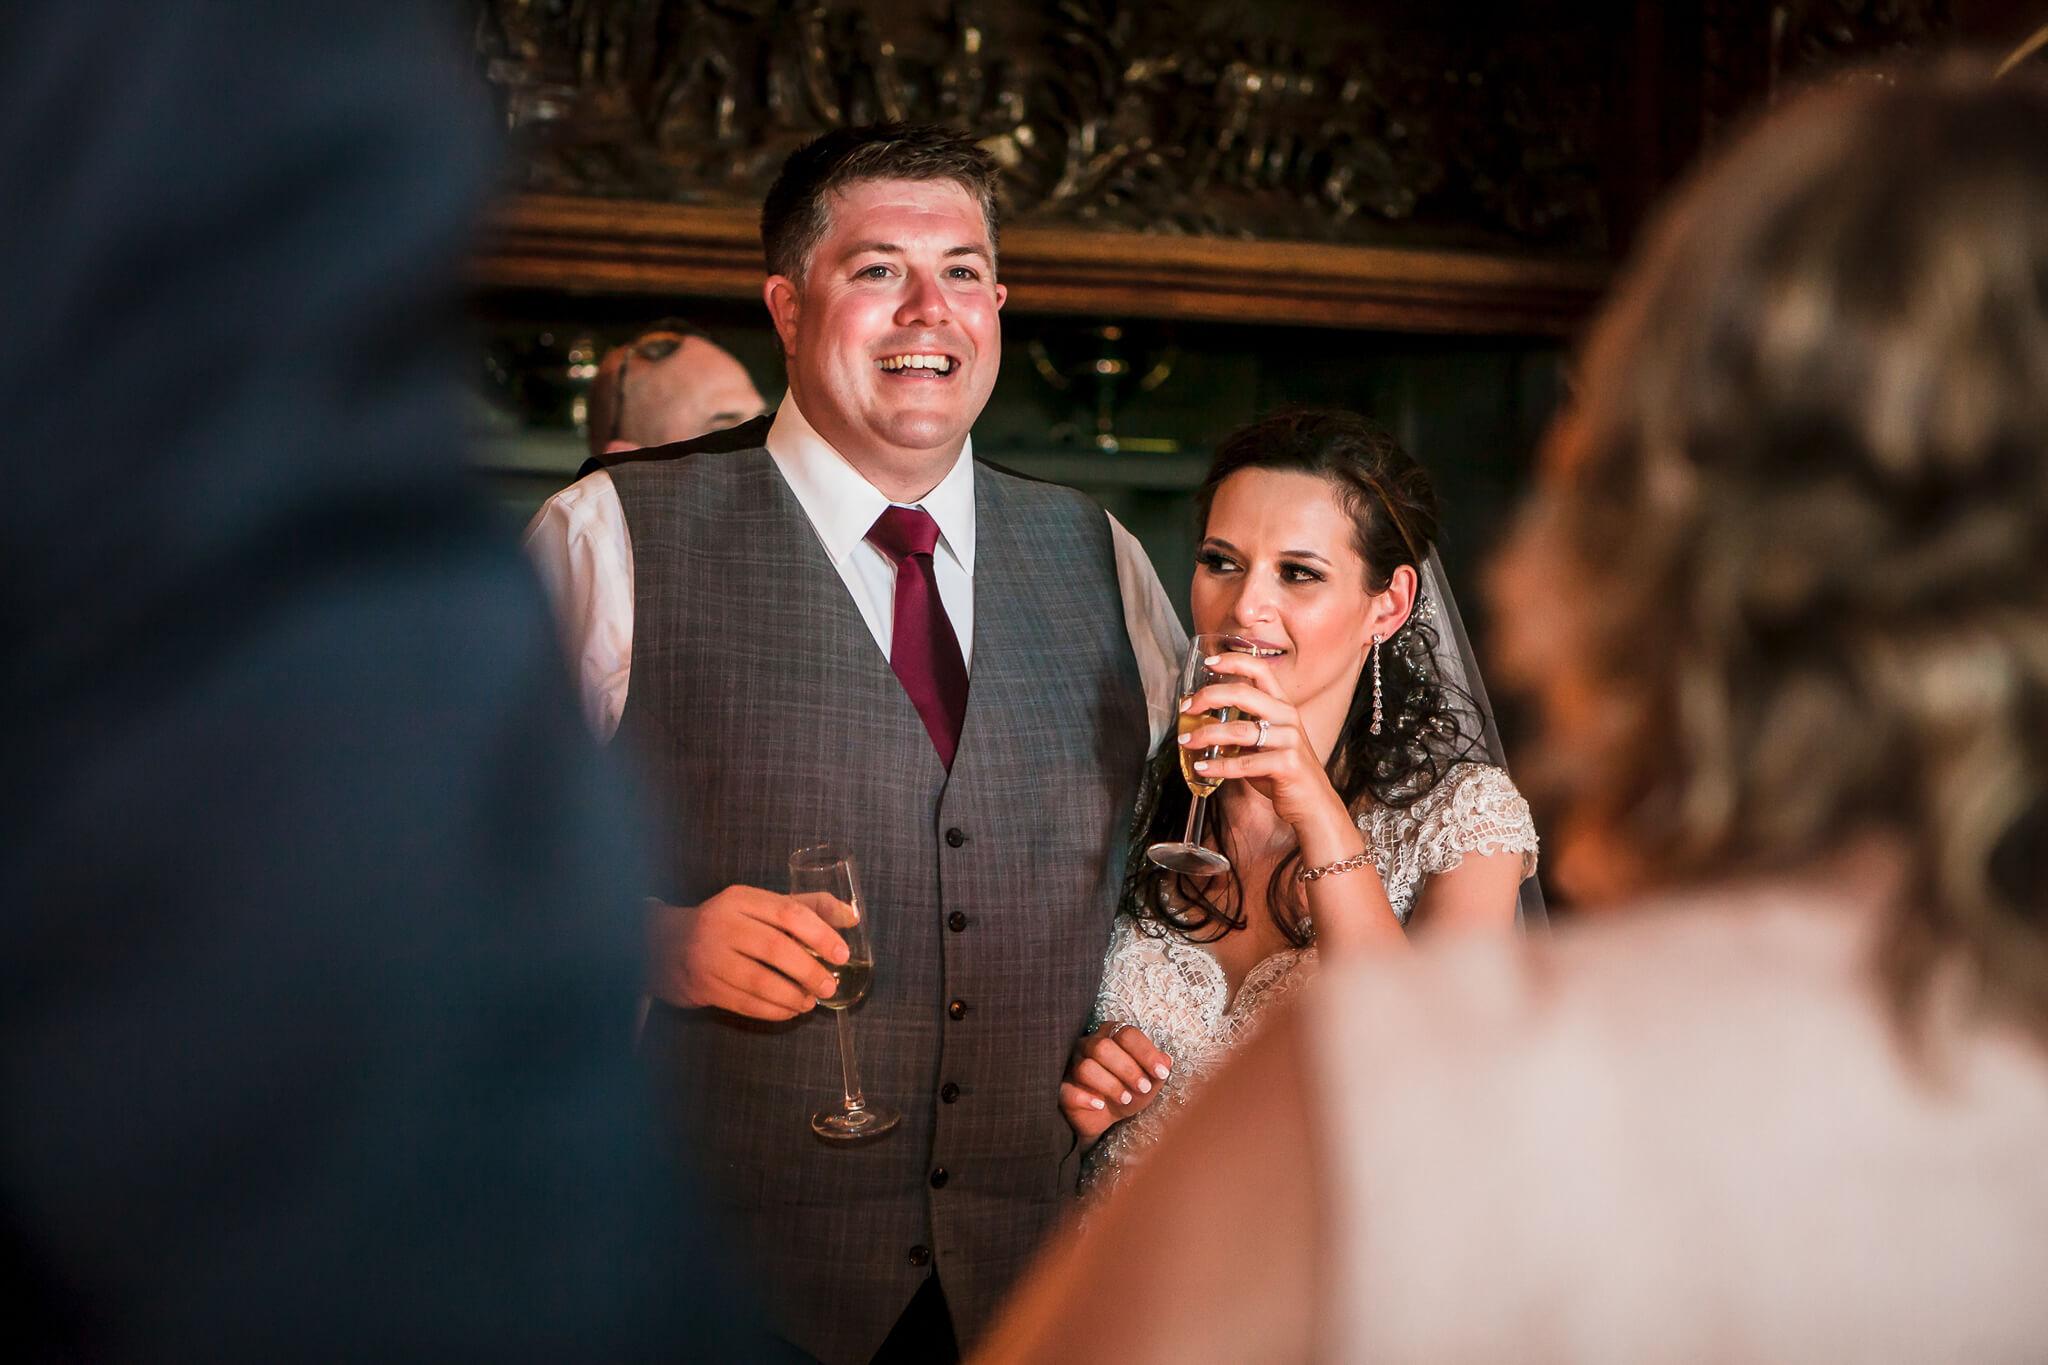 duns-castle-wedding-photograper-scotland-stanbury-photography-018